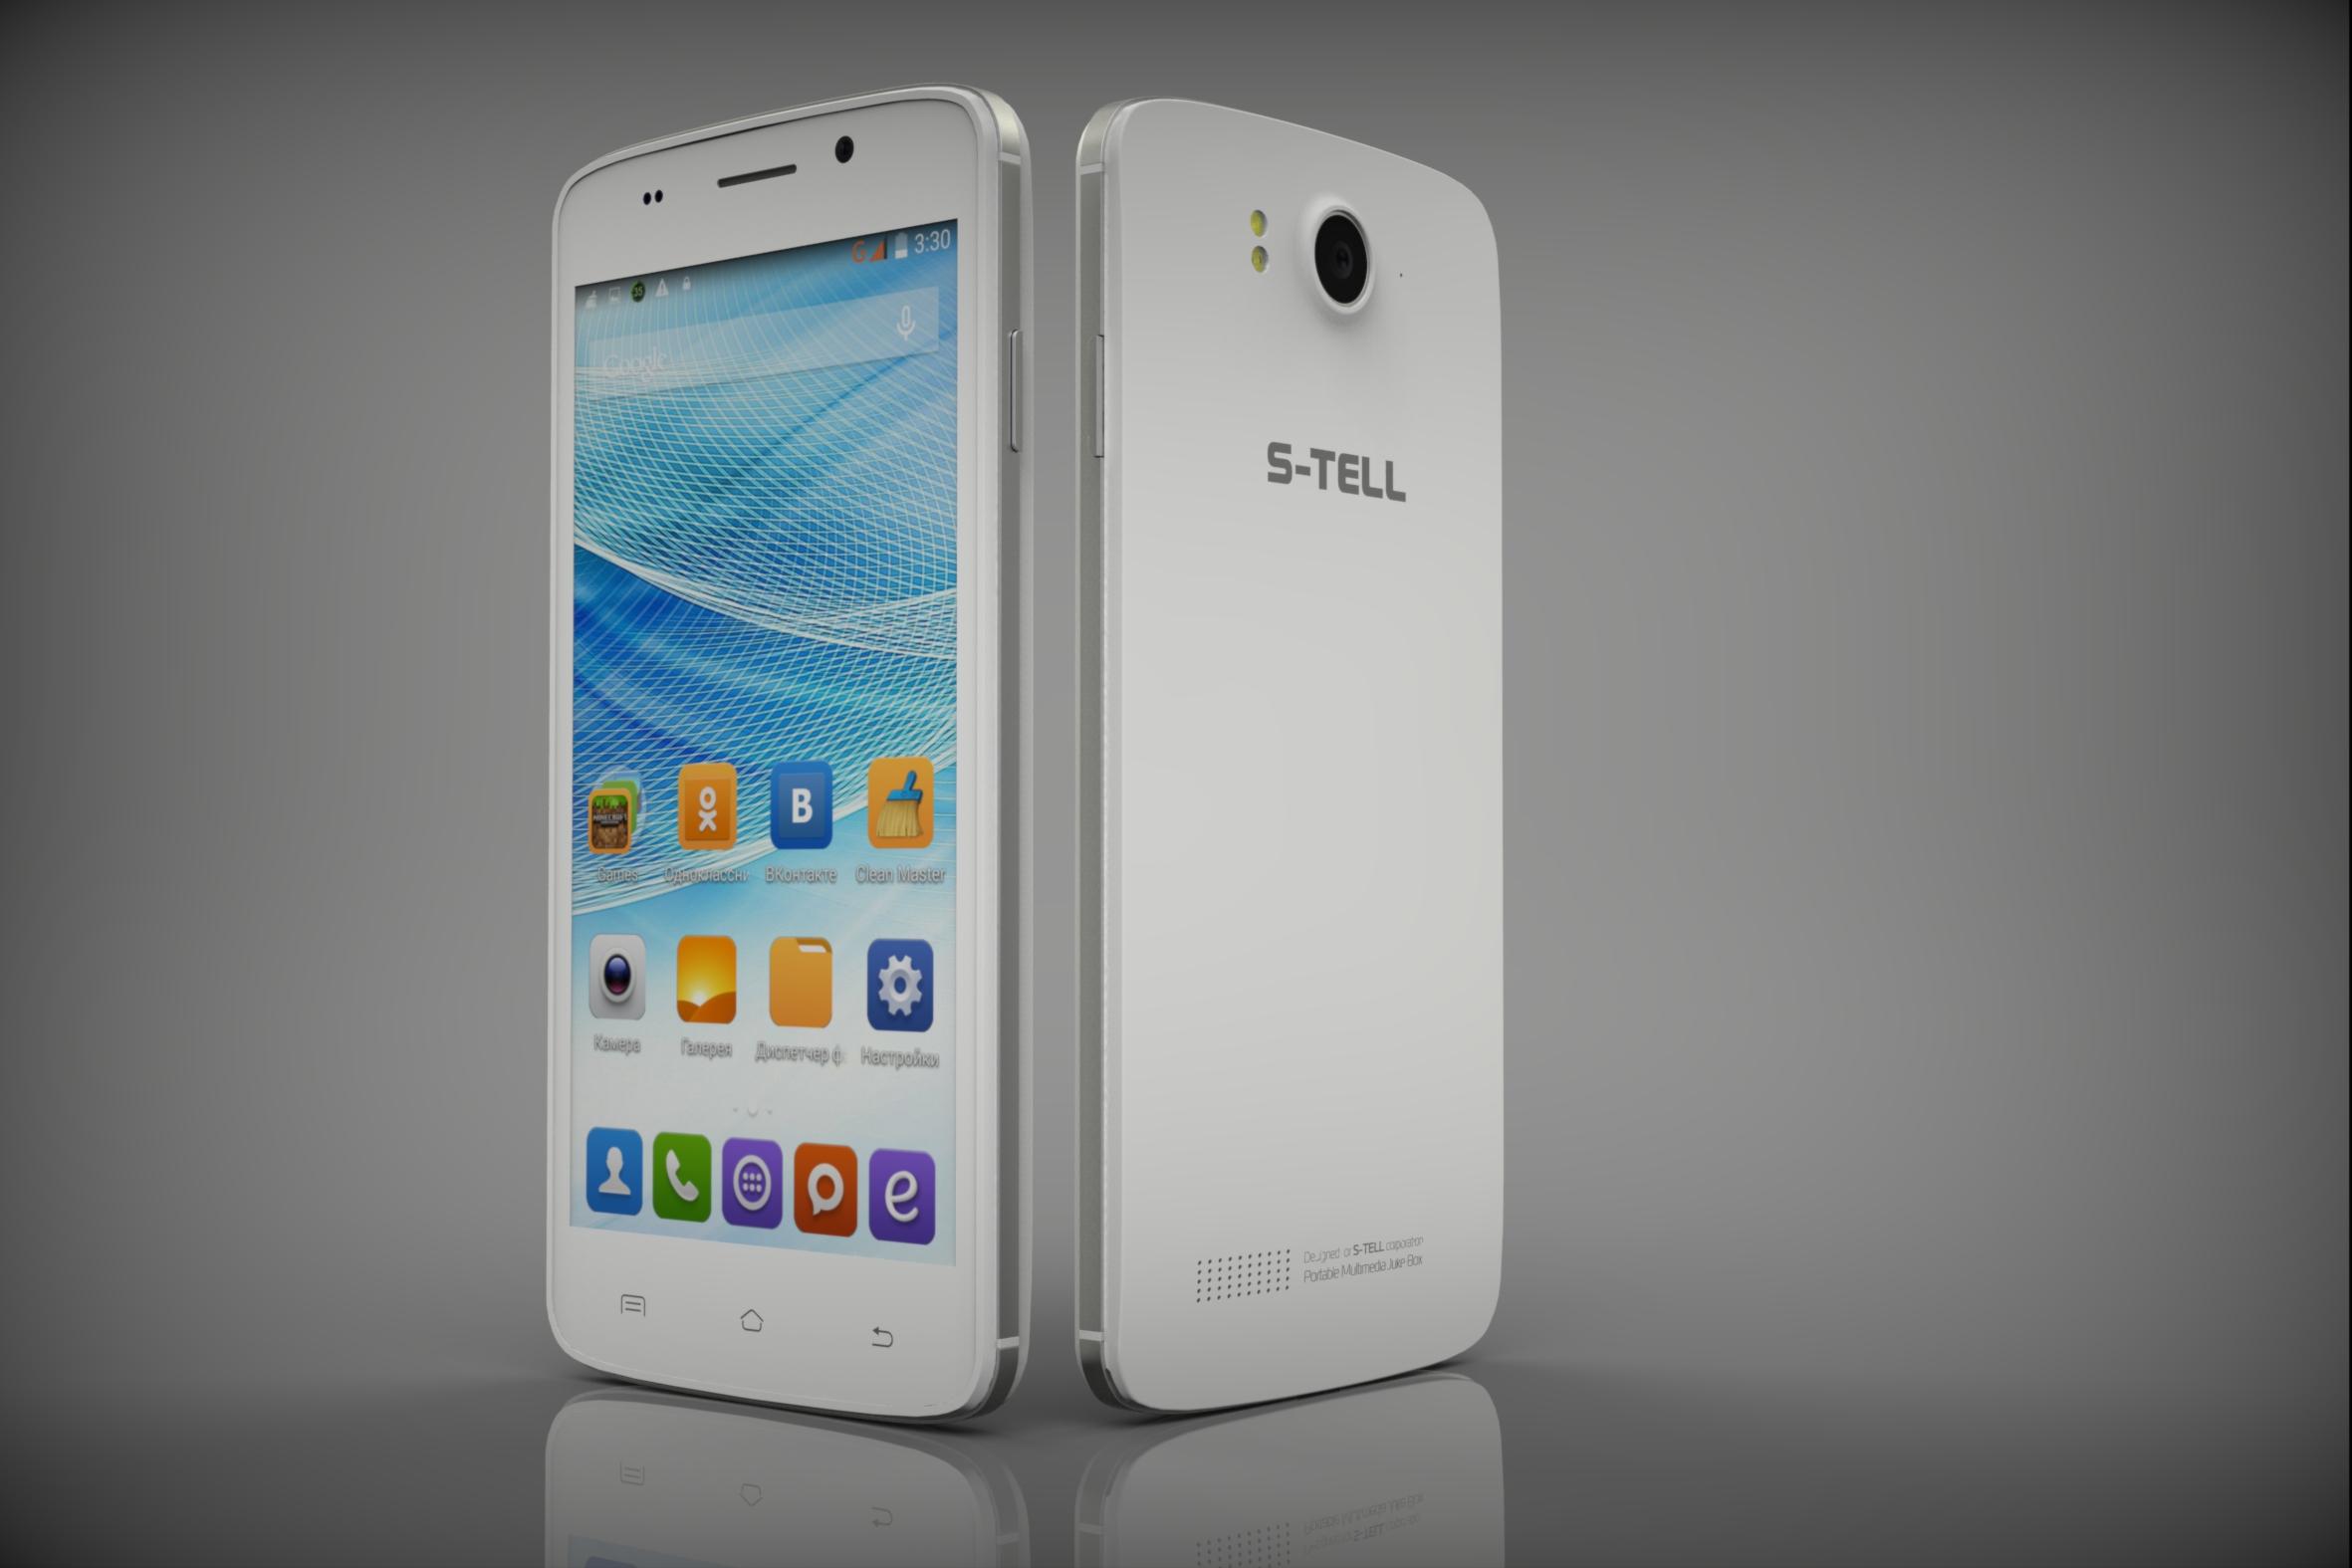 Компания S-TELL представляет новый смартфон M910